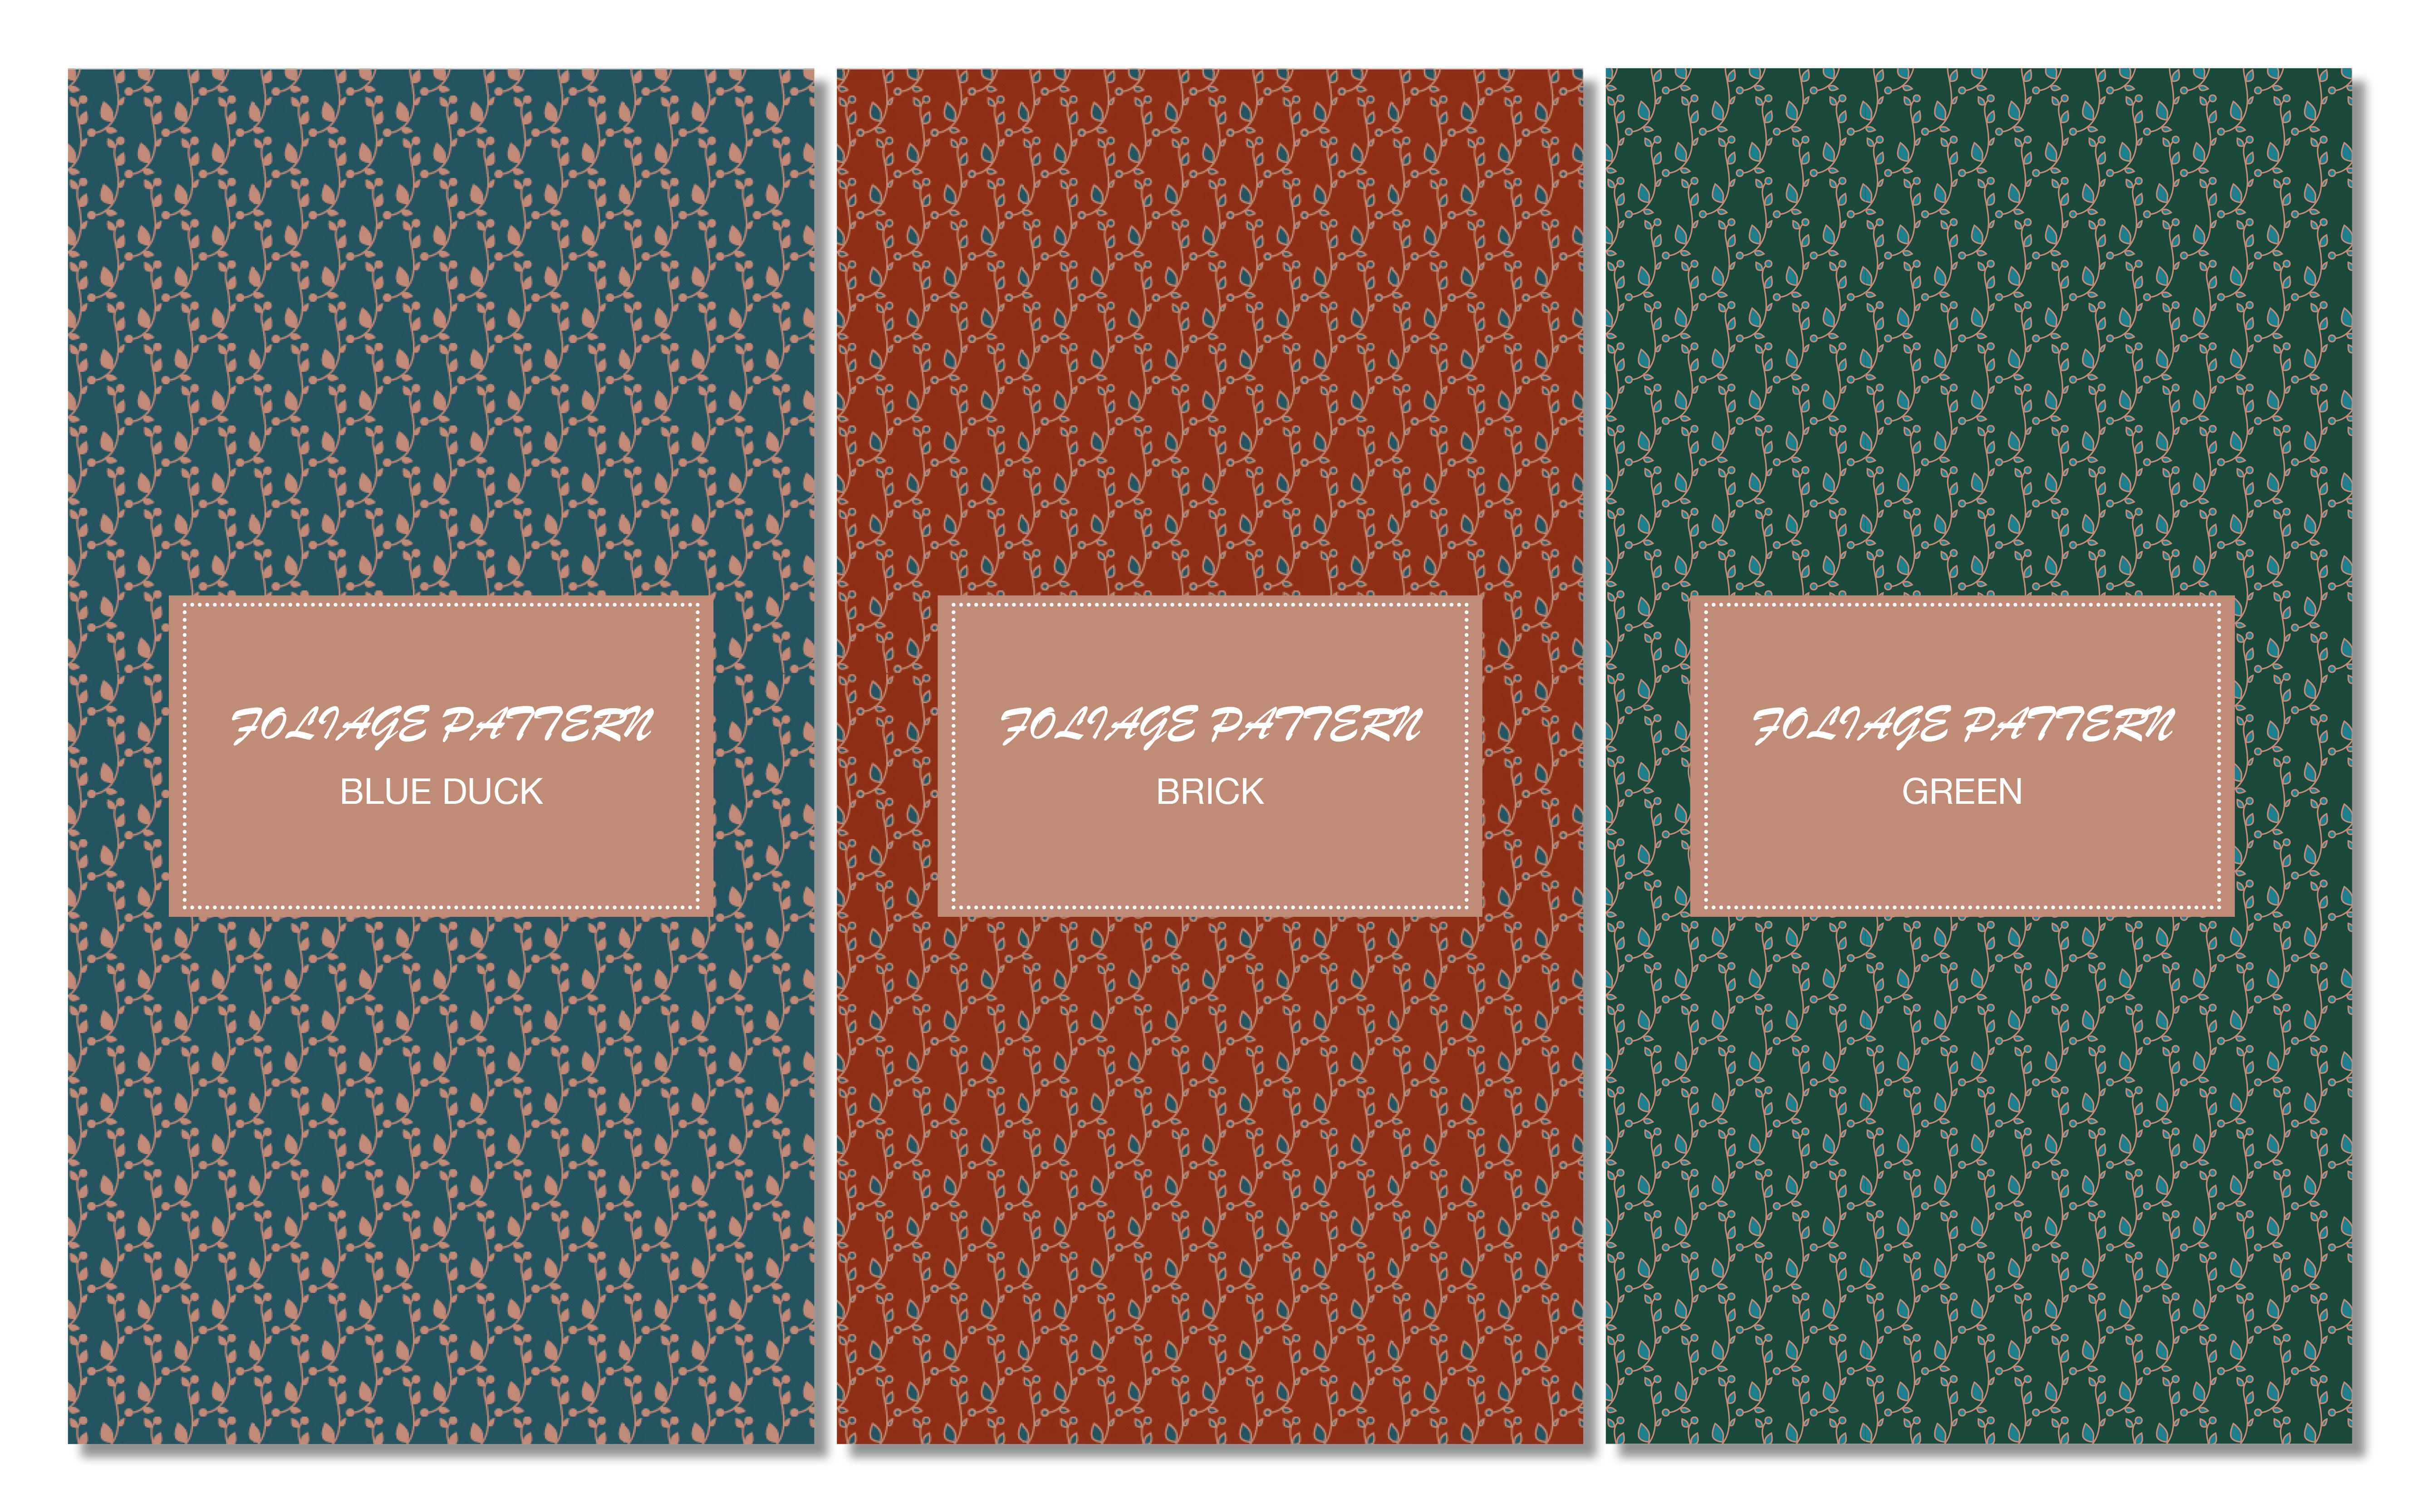 foliage-pattern-motif-papier-peint-tendance-design